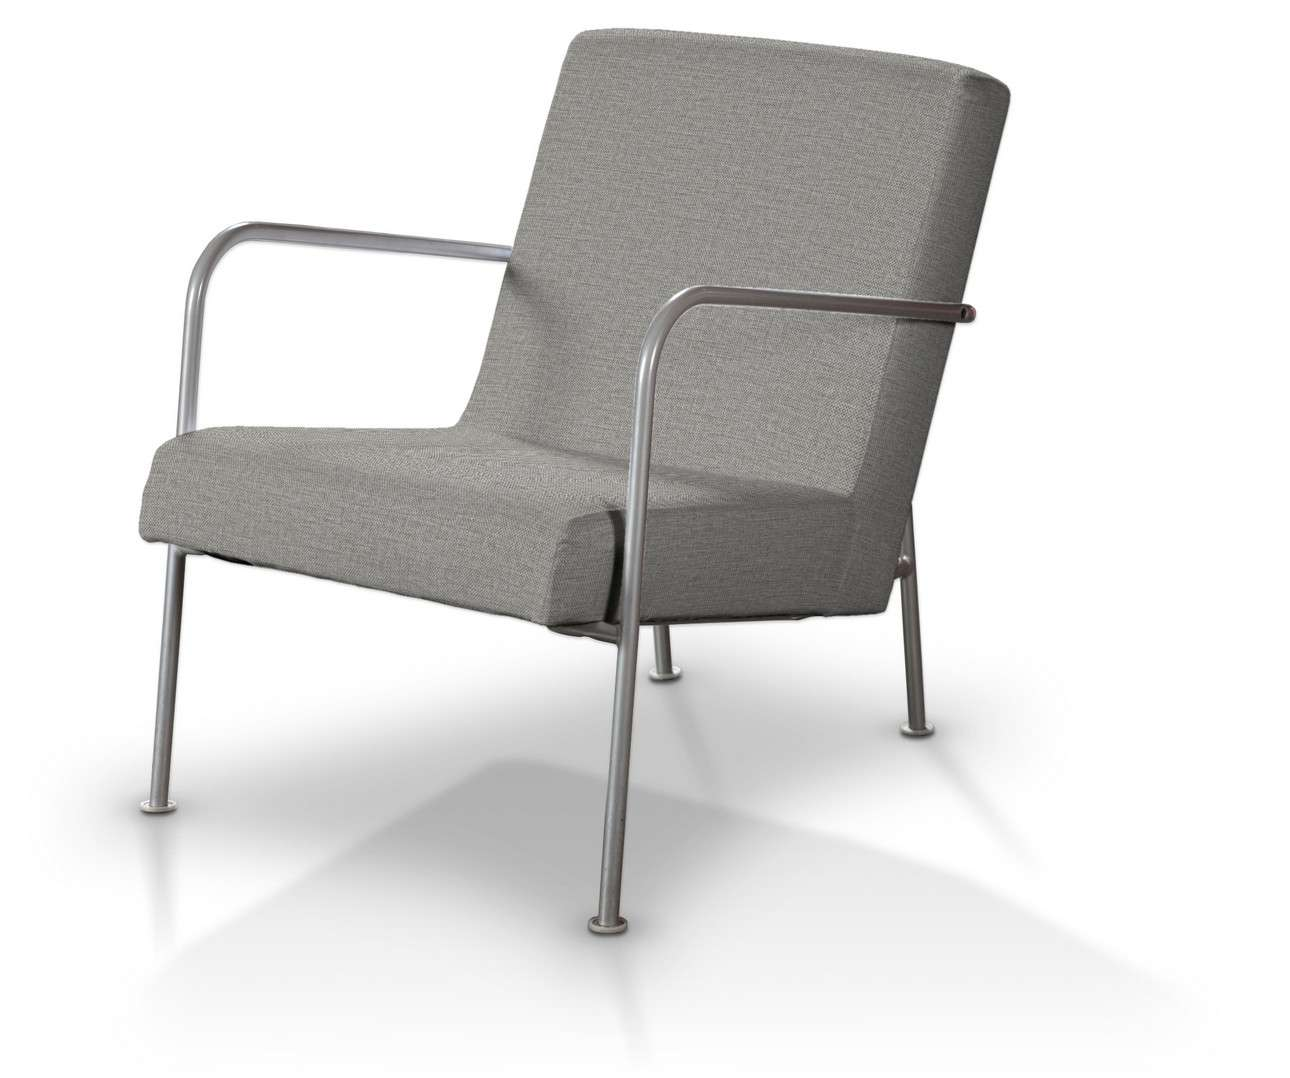 Potah na křeslo Ikea PS v kolekci Living II, látka: 160-89